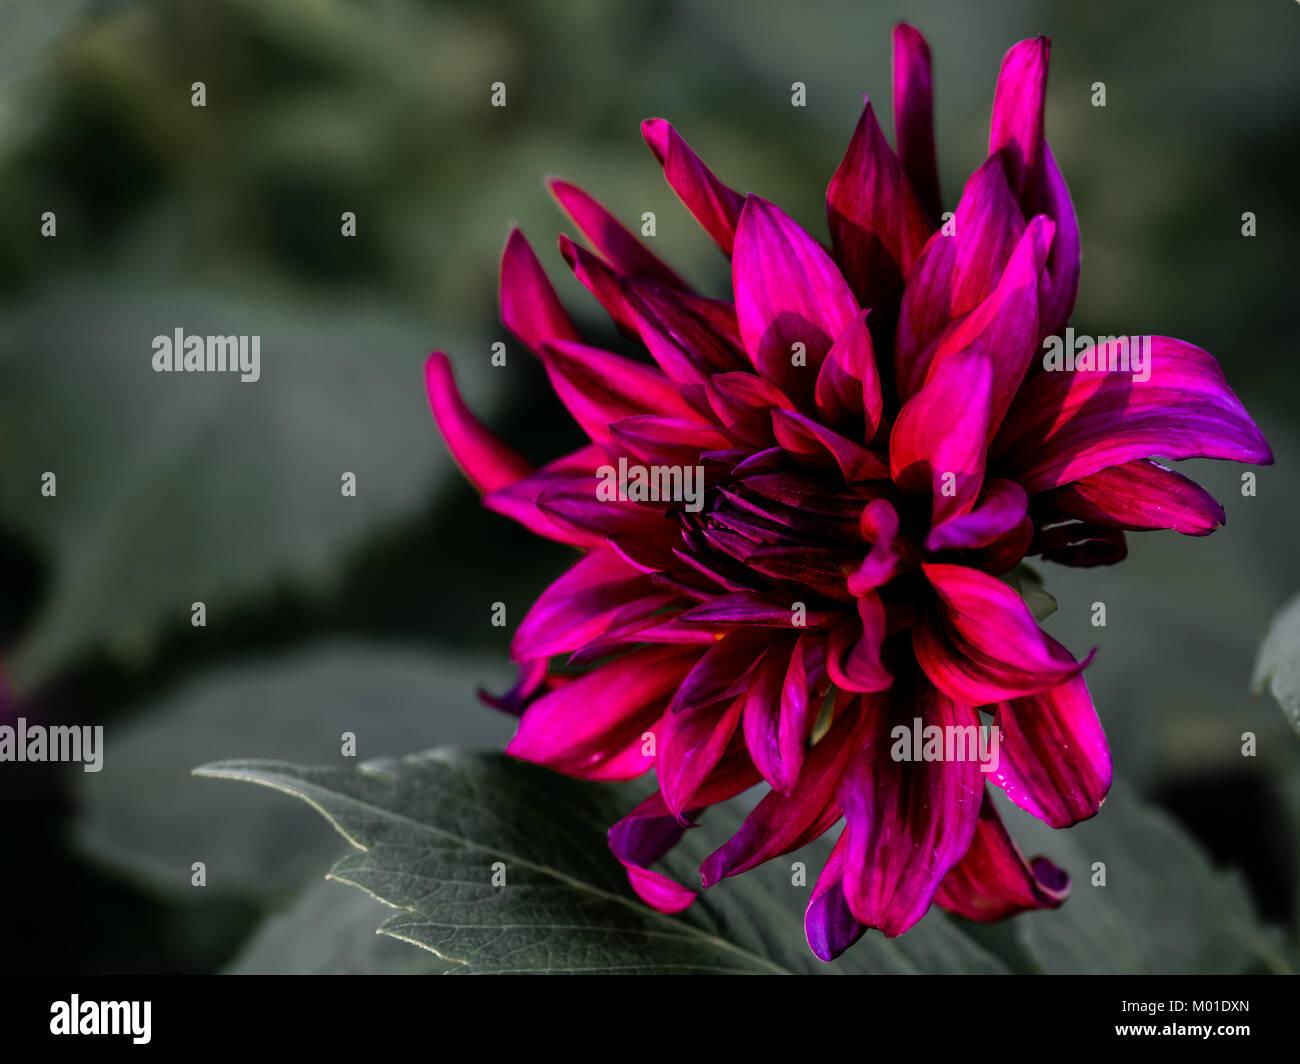 Dahlia, looks close to 'Prince Noir'. A ruffled, semi-cactus, dark burgundy dahlia with a nice defocused - Stock Image